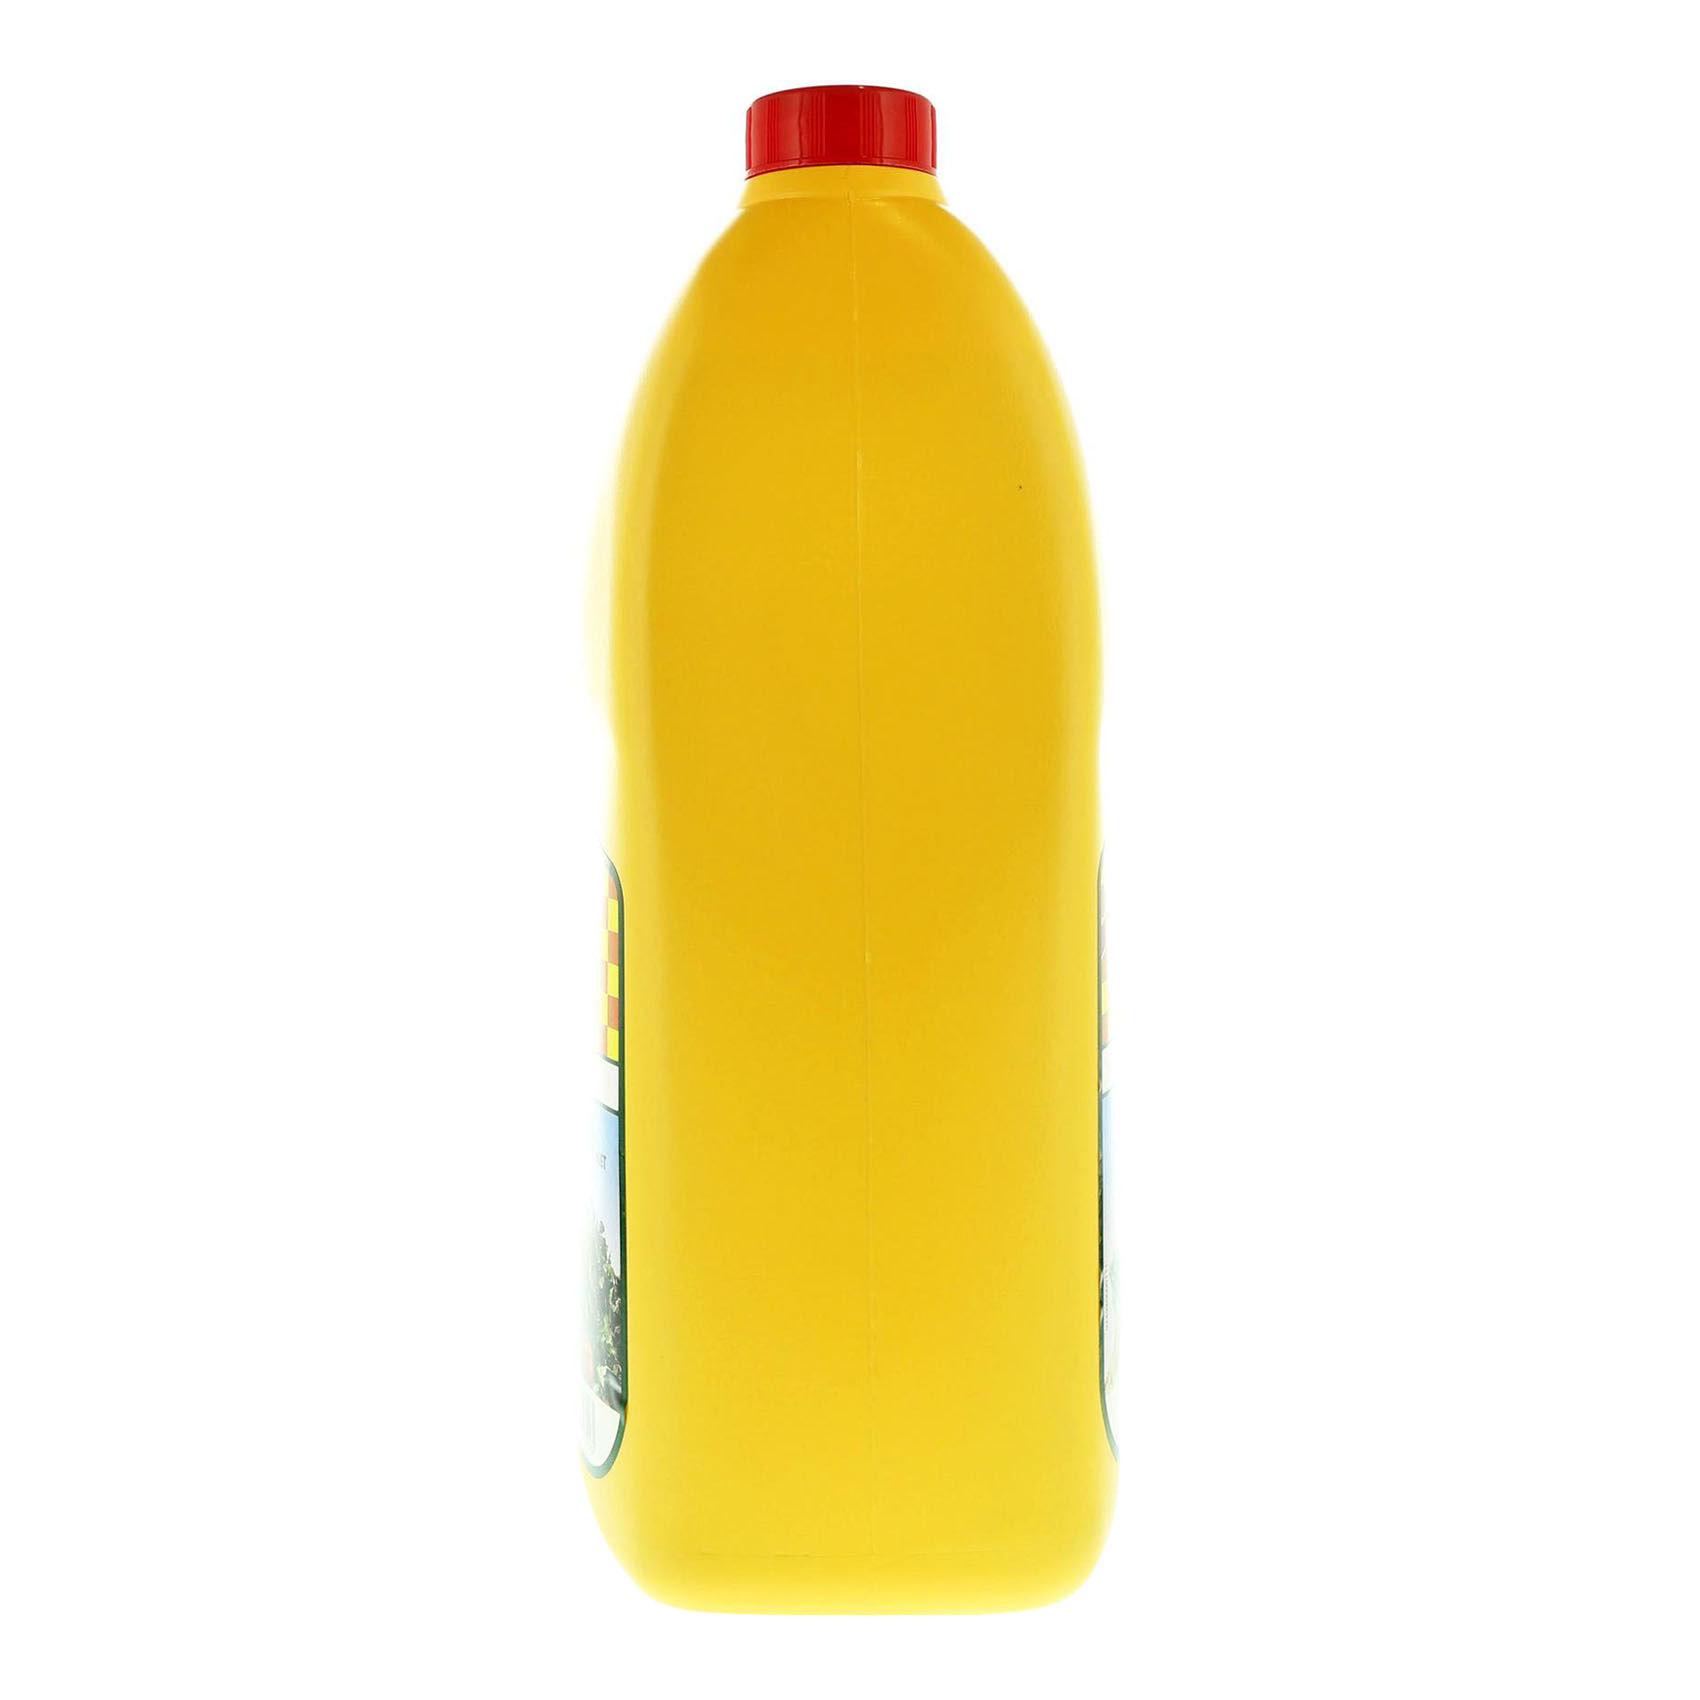 HAYAT VEGETABLE OIL 5L